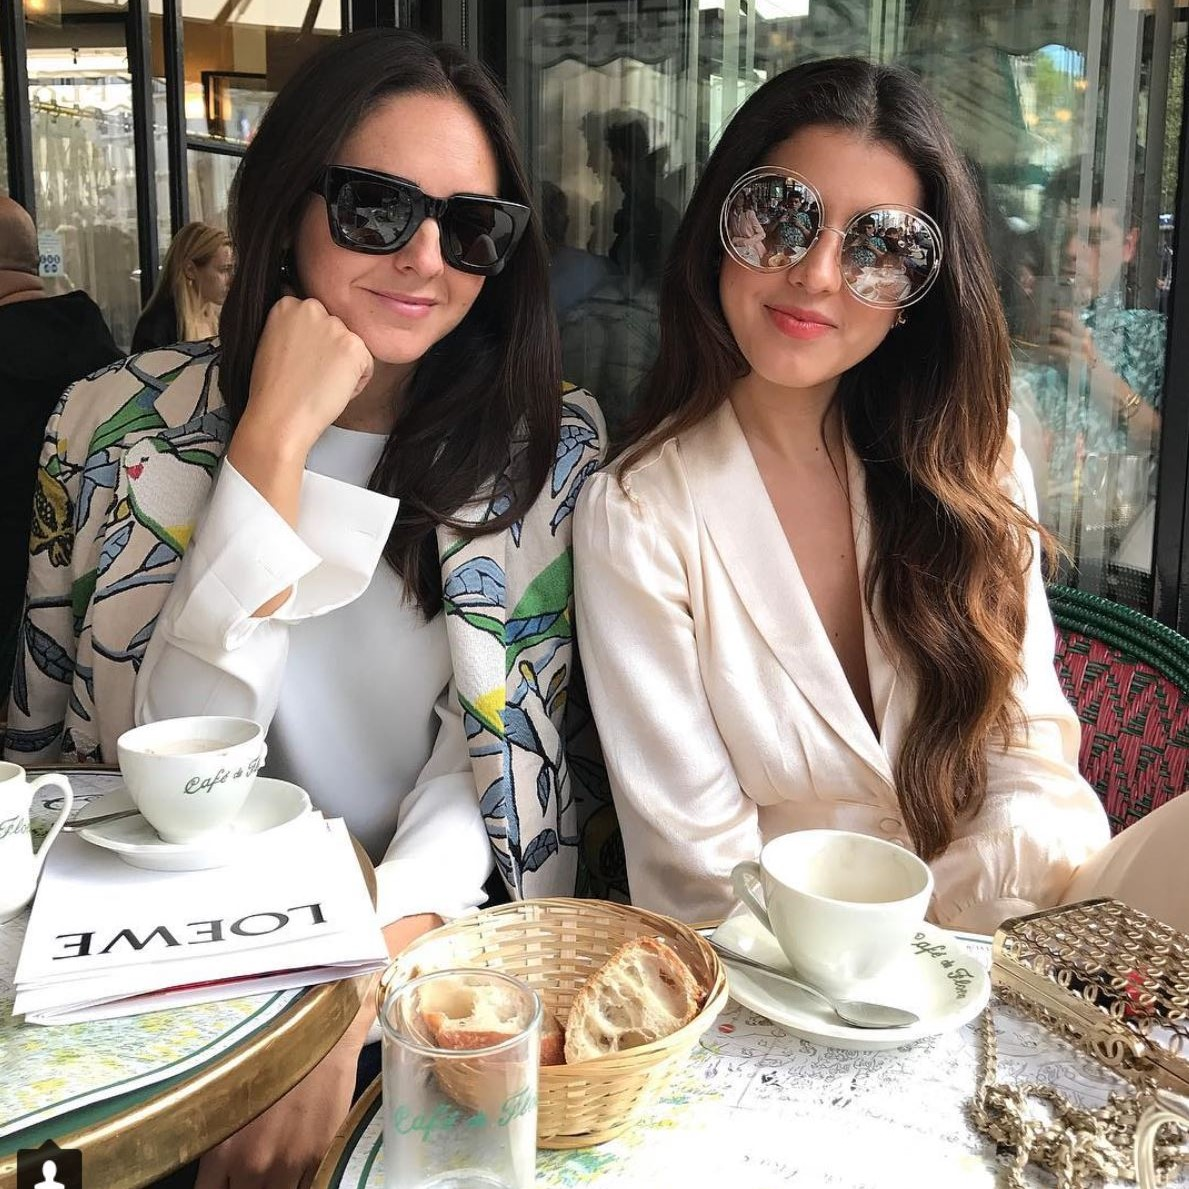 BRENDA DIAZ DE LA VEGA - Dos Loros Kimono  #Co-founder #buro24/7 #luvit #CEO #almagirl #girlboss  @ Paris Fashion Week